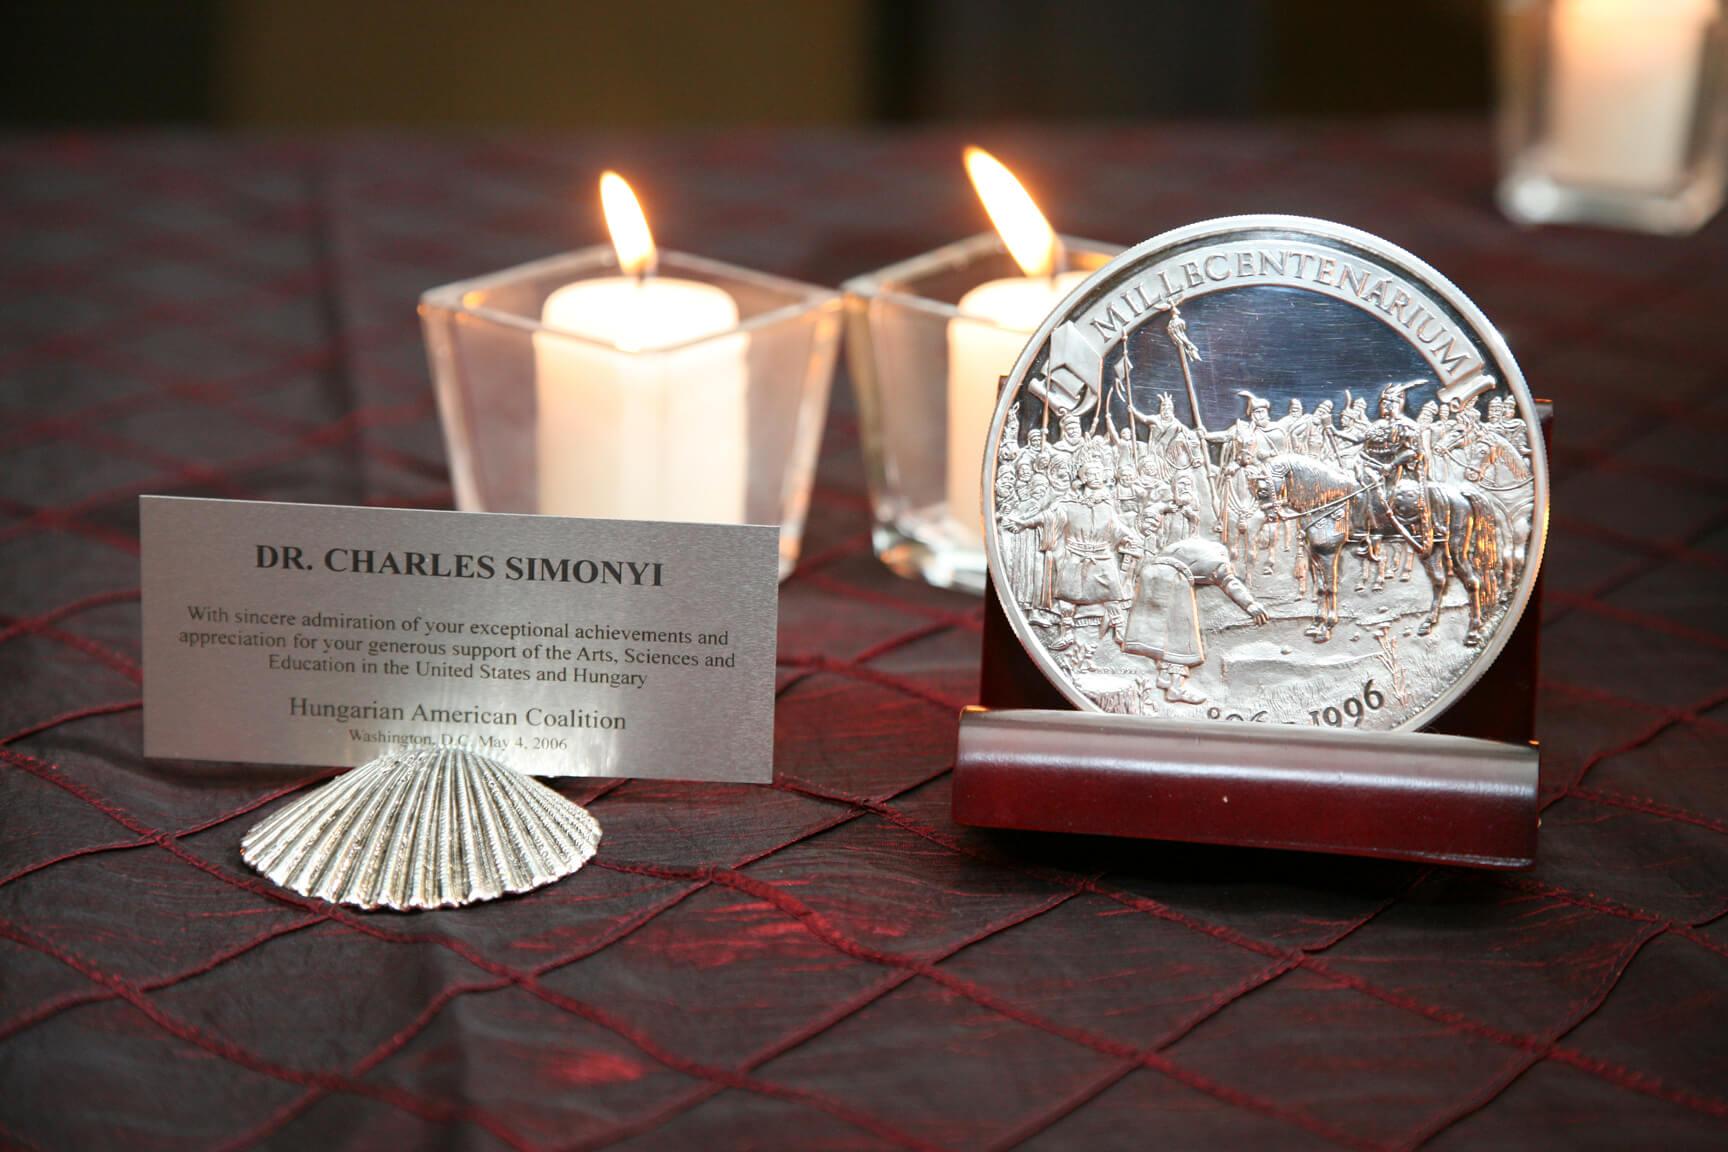 Silver medallion presented to Dr. Charles Simonyi